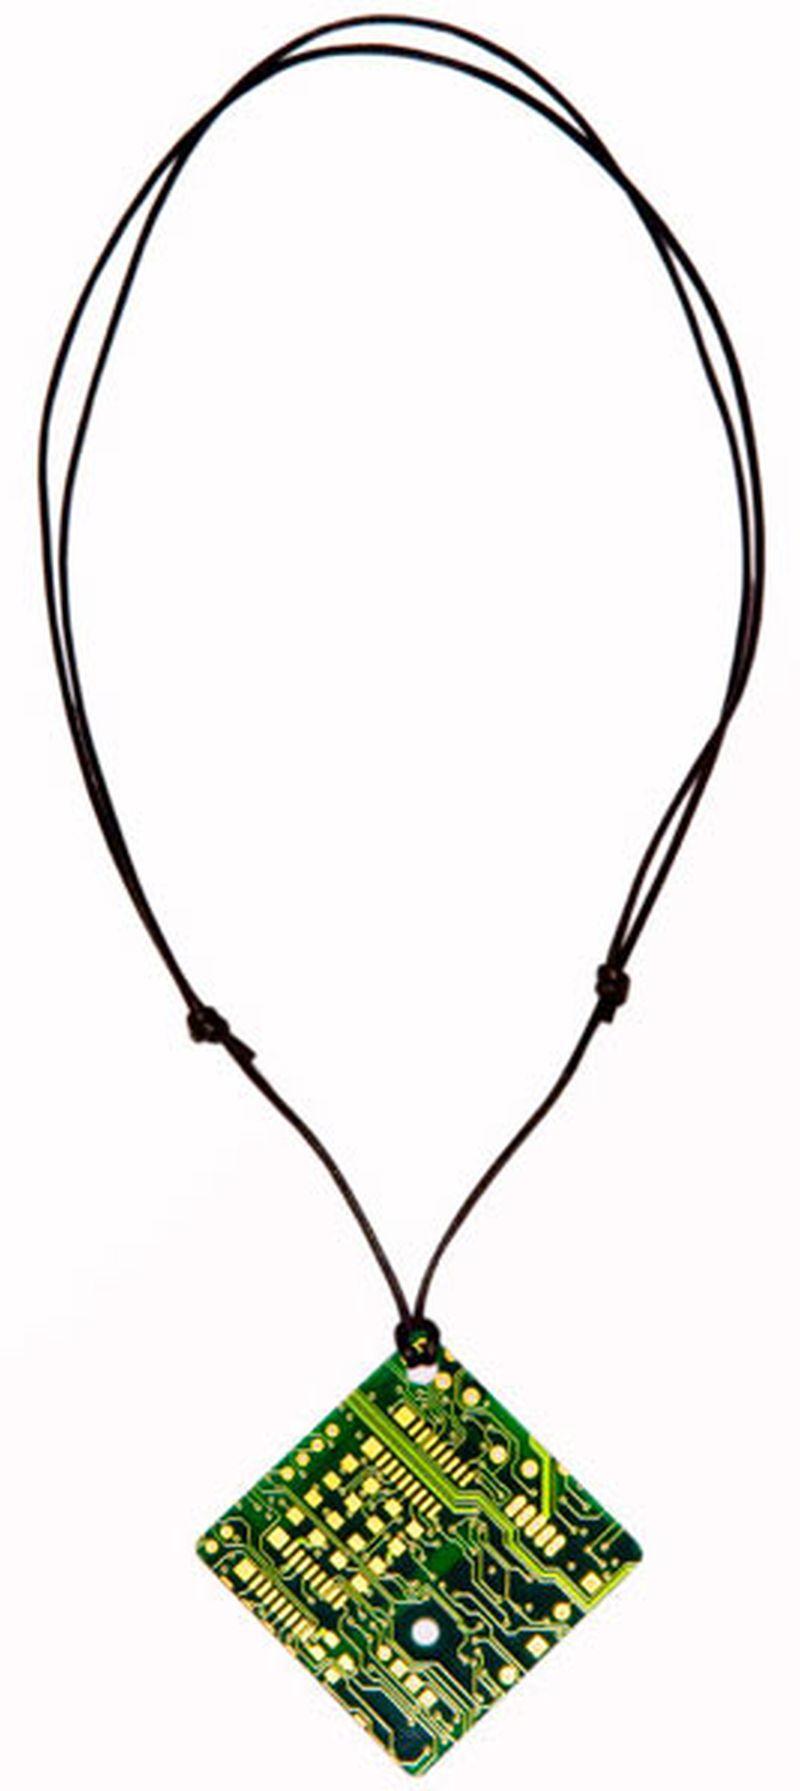 PCB jewelry